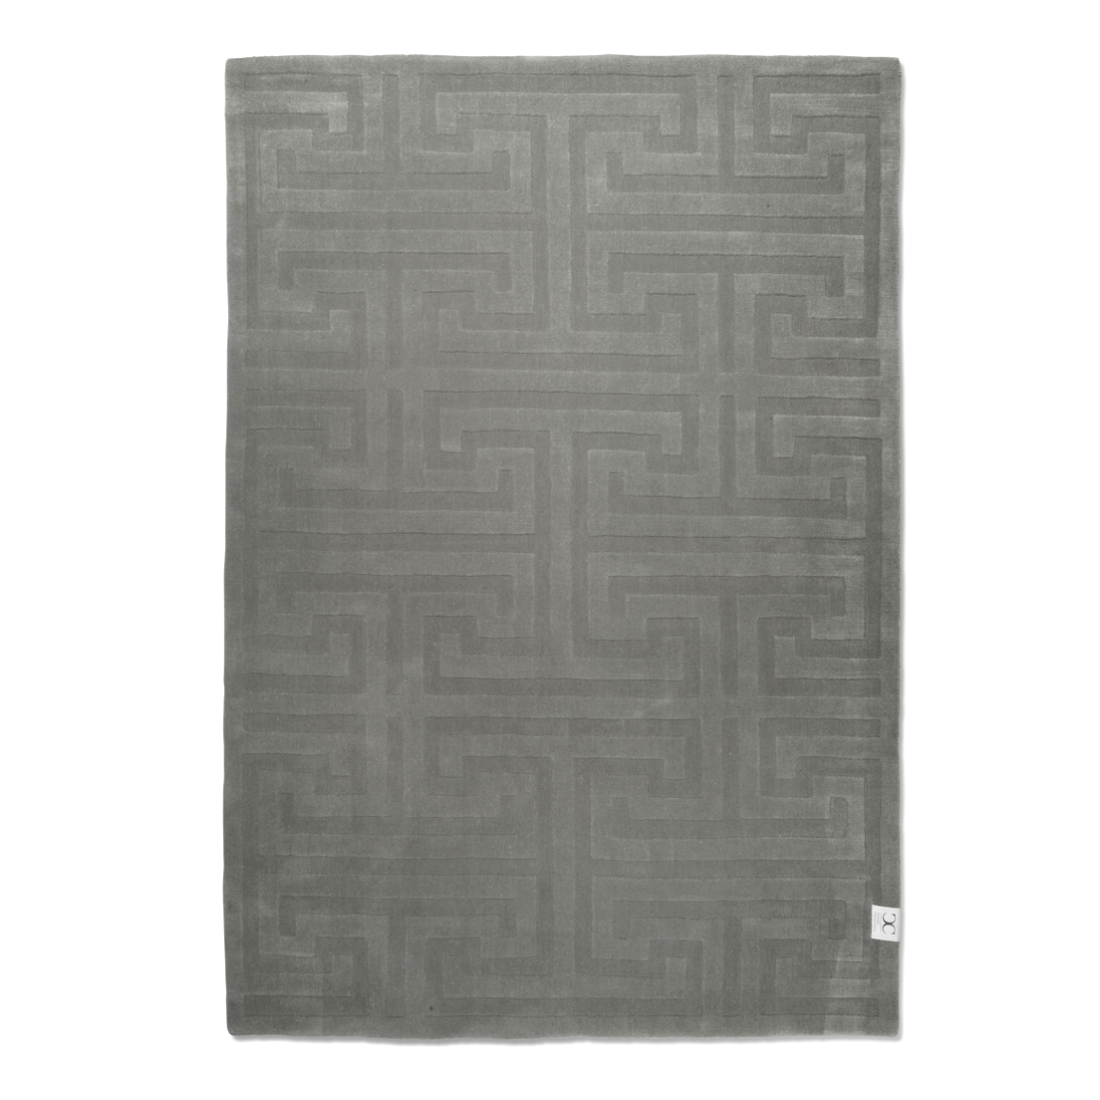 Silvergrå ullmatta KEY WOOL 170 x 230 cm, Classic Collection